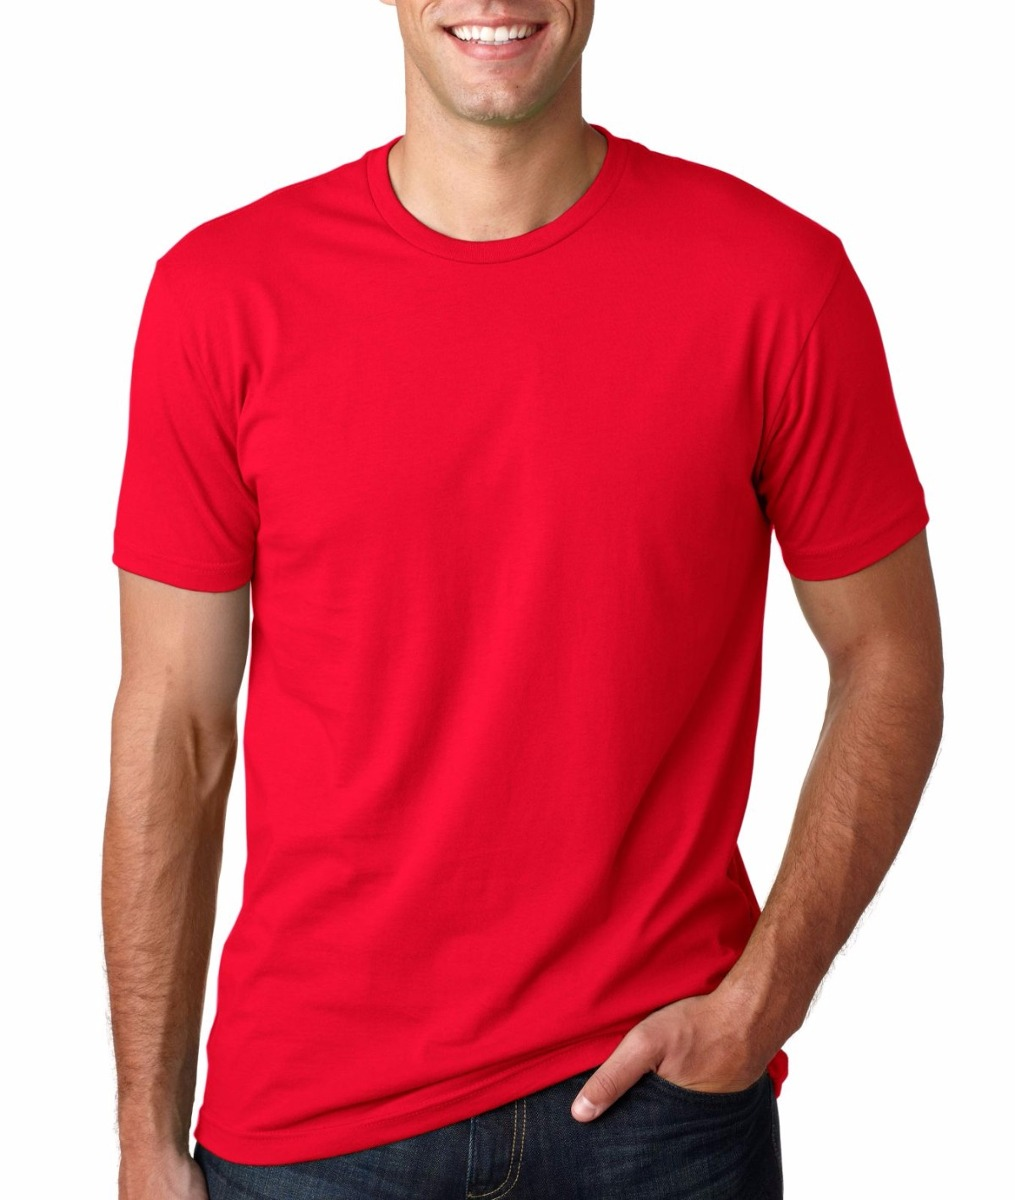 8073ee2b44af0 kit 10 camiseta lisa atacado básica algodão camisa lisa. Carregando zoom.